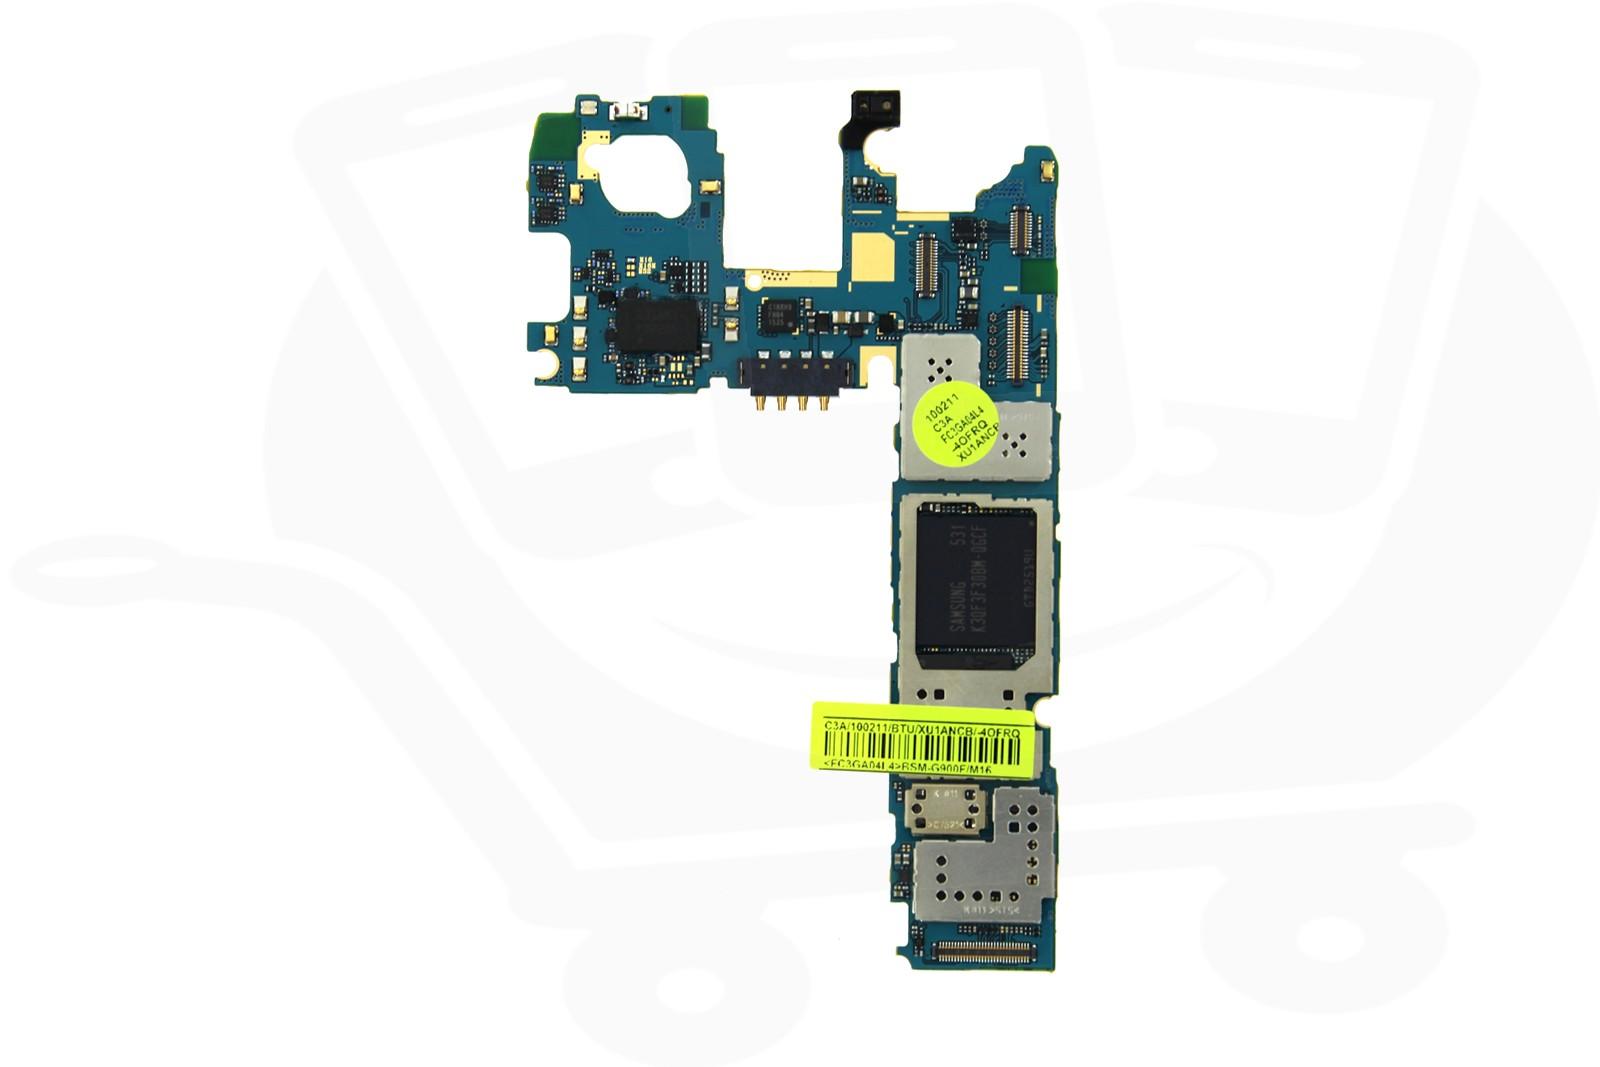 Genuine Samsung Galaxy S5 SM-G900 Main Board / Motherboard - GH82-08237A